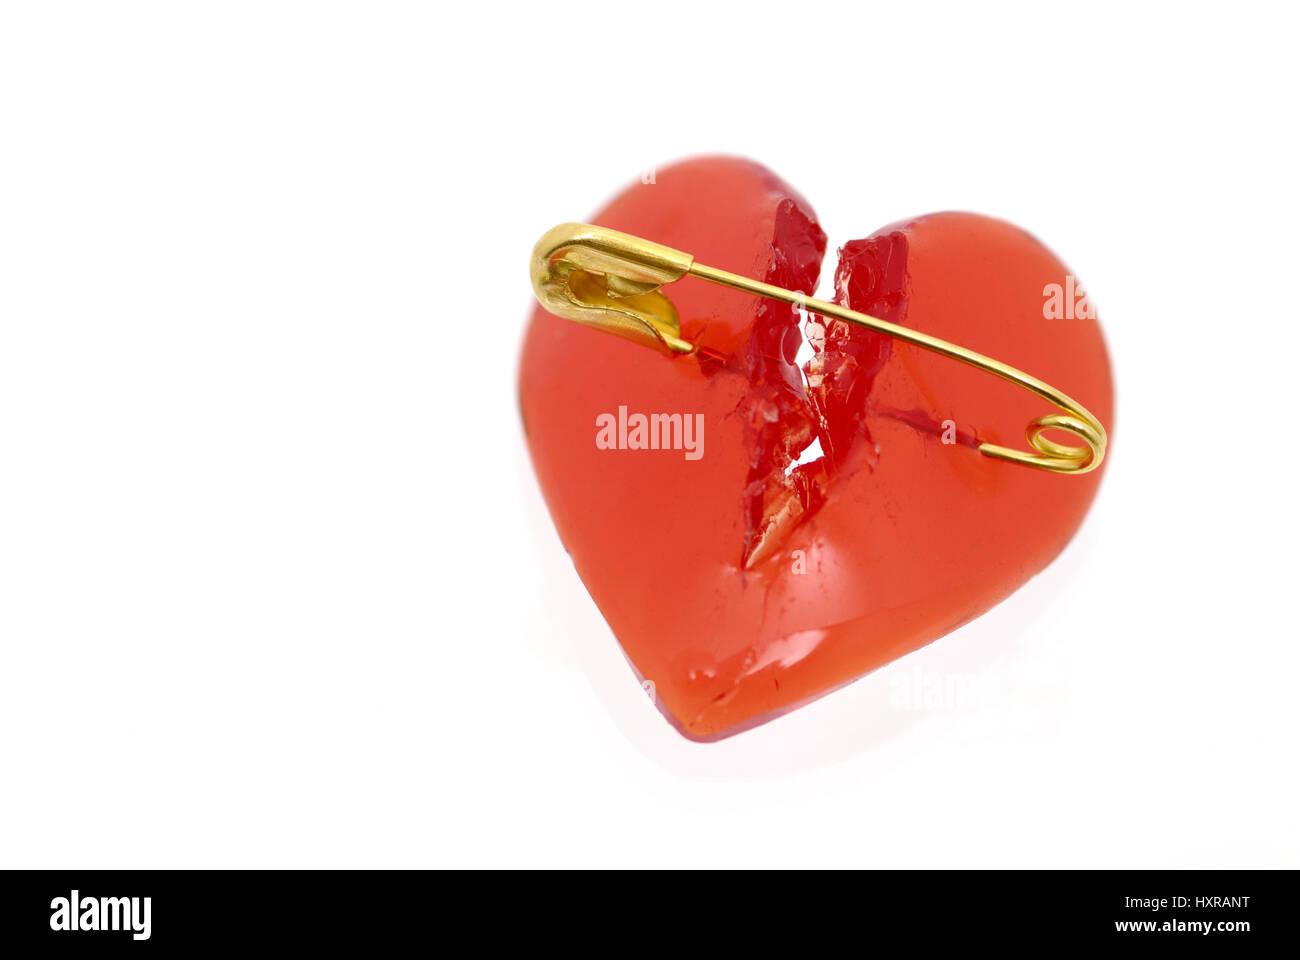 Heart Hearts Cut Cut Broken Broken Tattered Tears Up Red